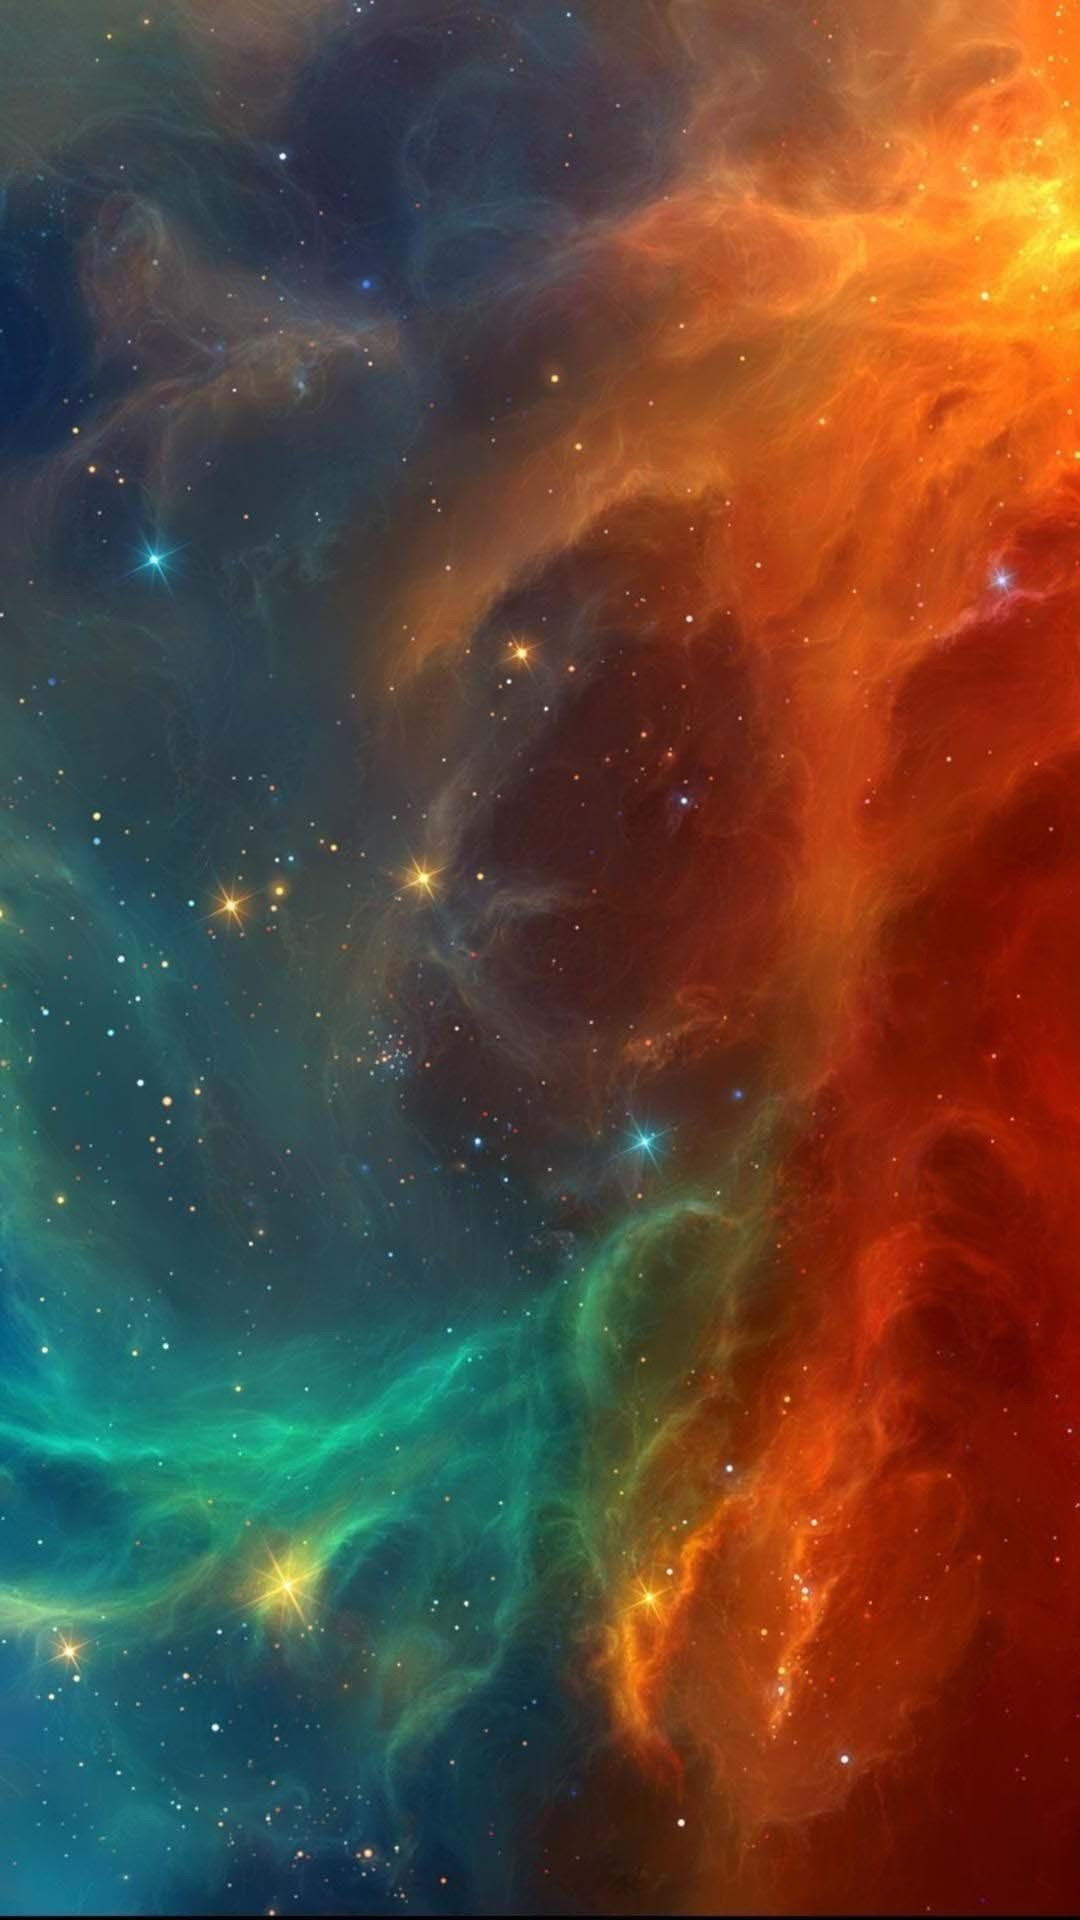 Universe Nebula Universe Space Wallpaper Background Wallpaper Background Iphone Phone Mobi Space Iphone Wallpaper Galaxy Wallpaper Galaxy Wallpaper Iphone